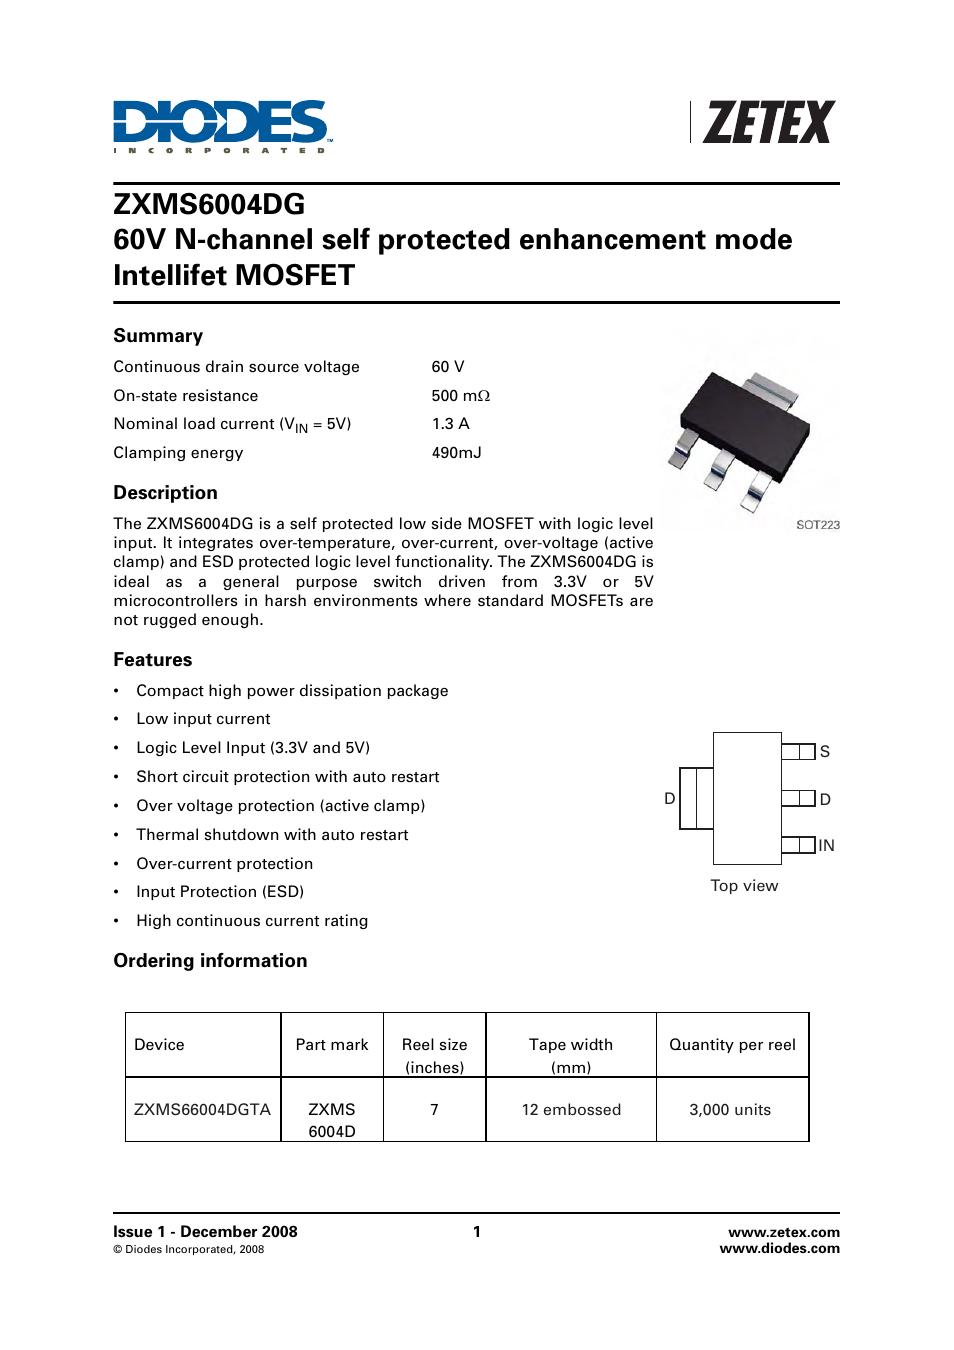 Diodes Zxms6004dg User Manual 10 Pages Logic Overvoltage Protection